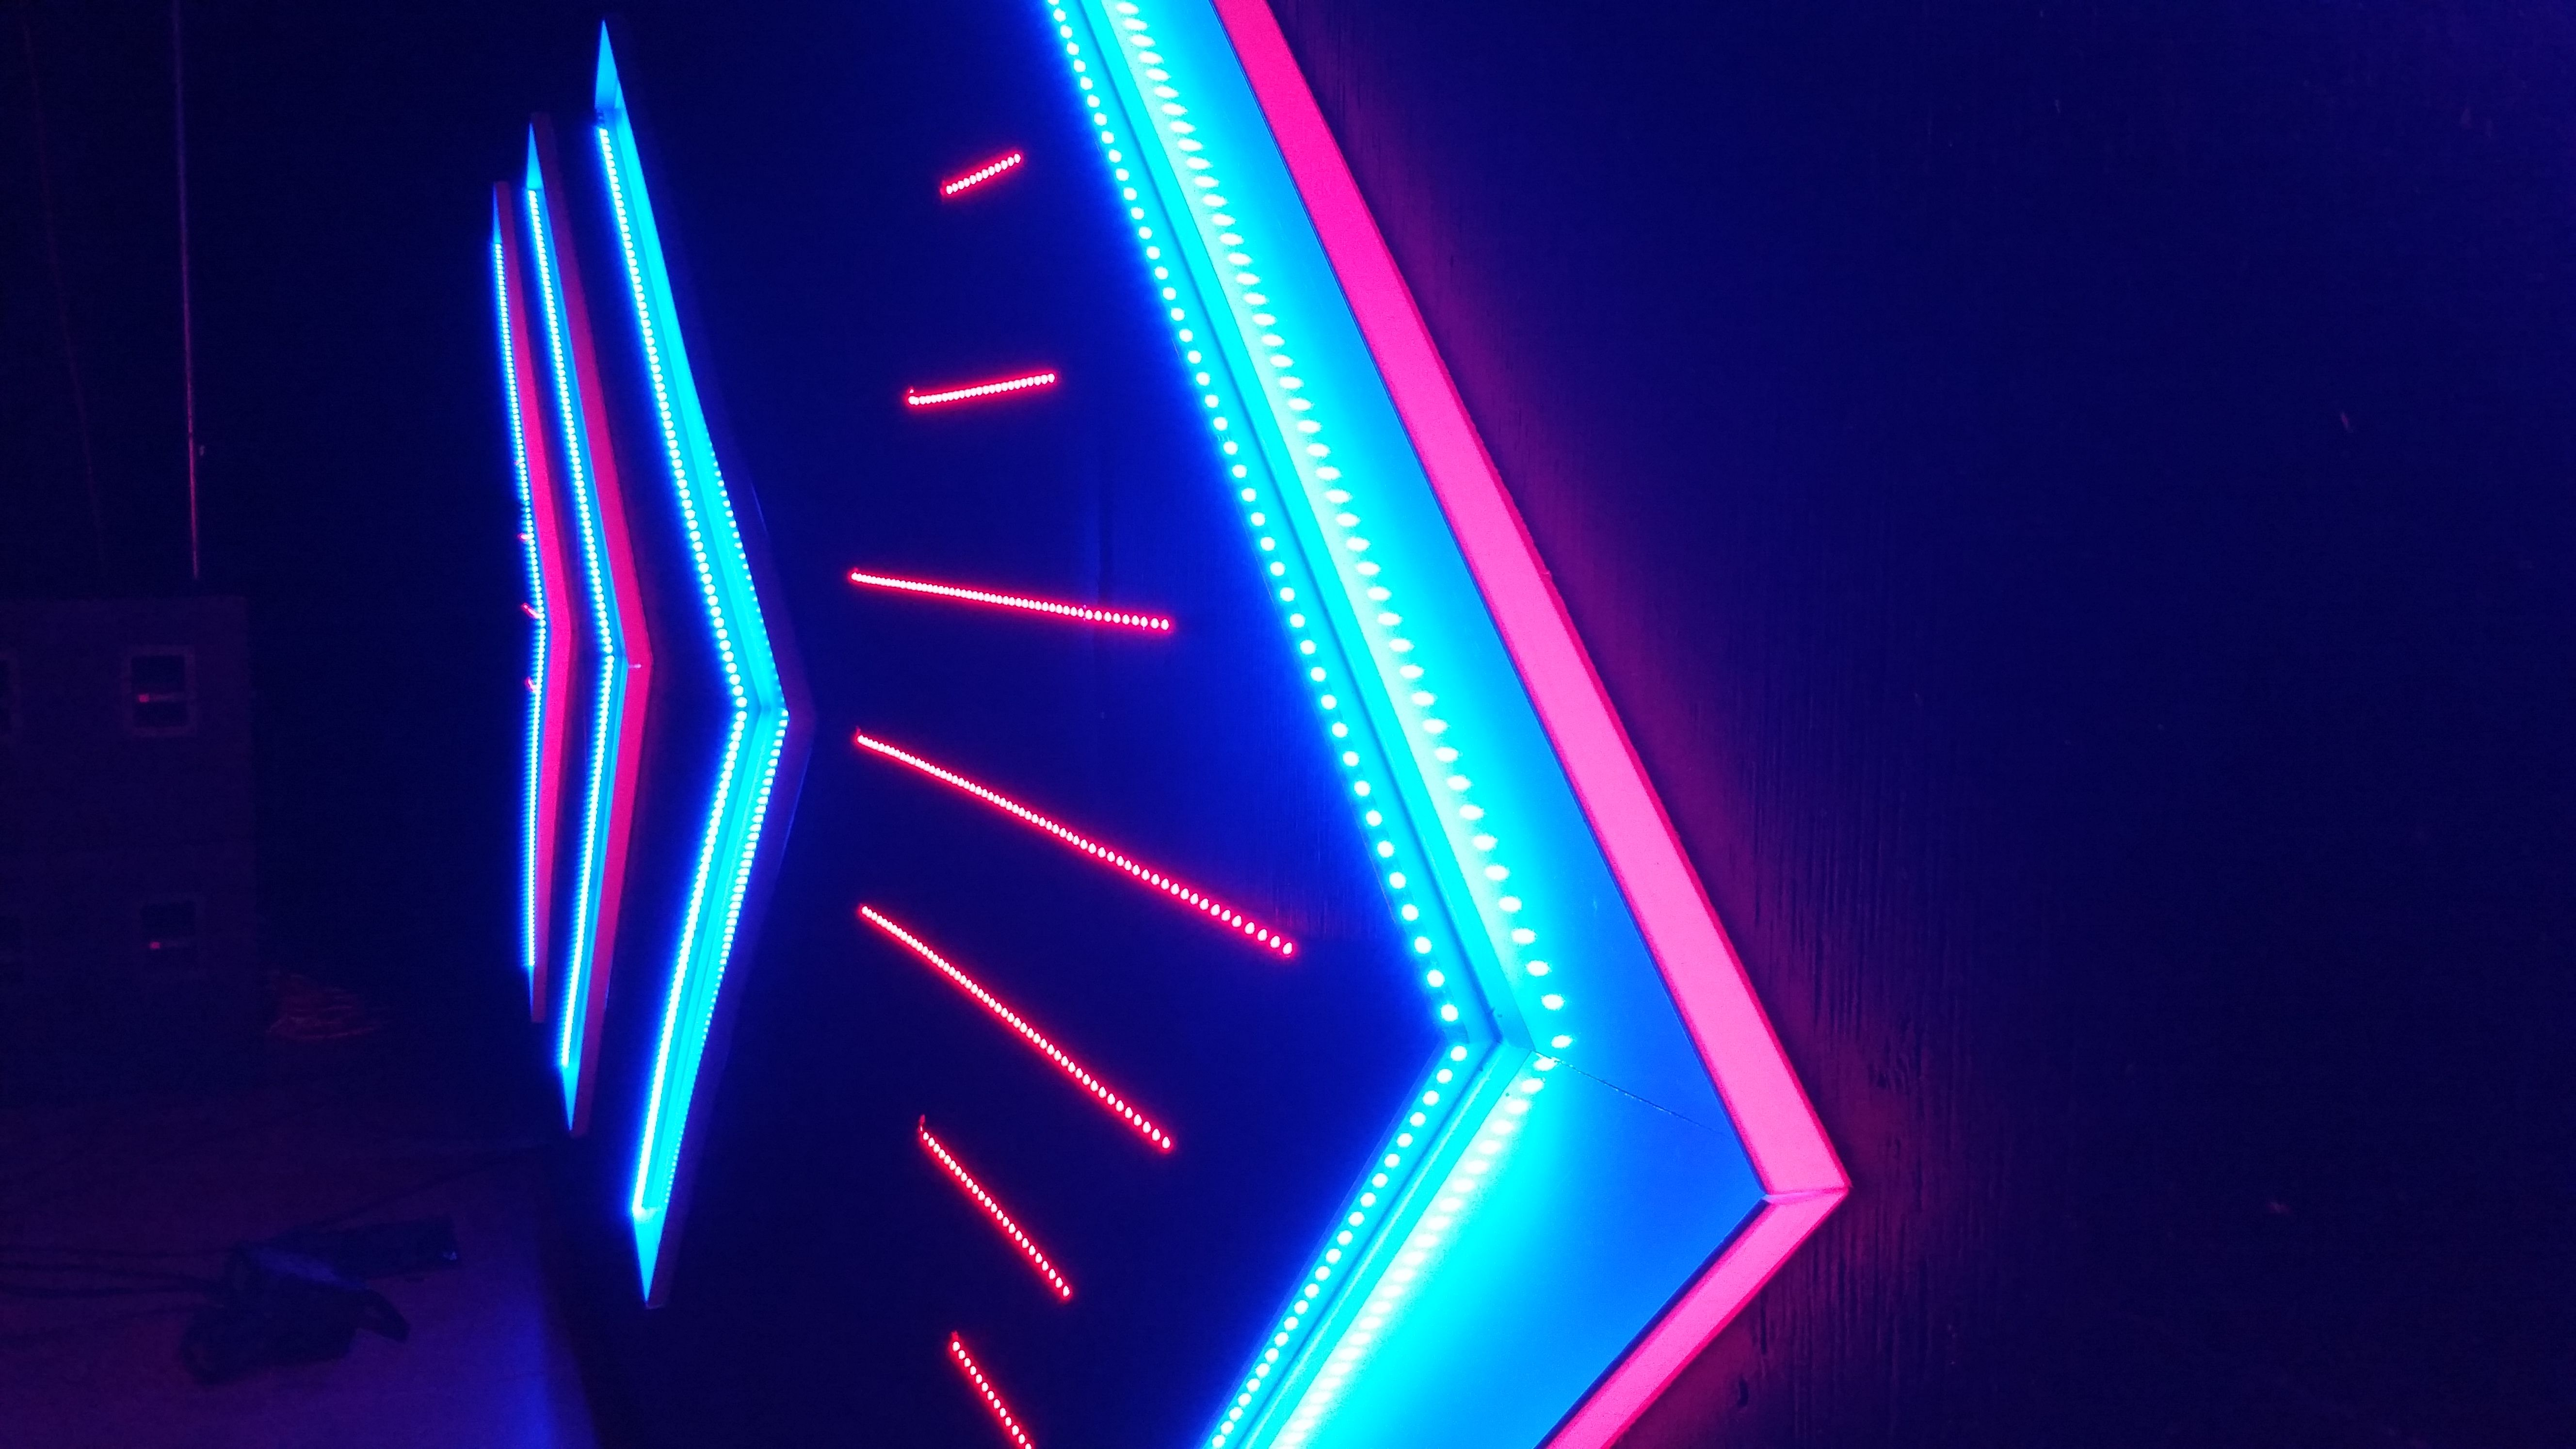 LED Tape + White Board + PVC | Church Stage Ideas | Pinterest ...